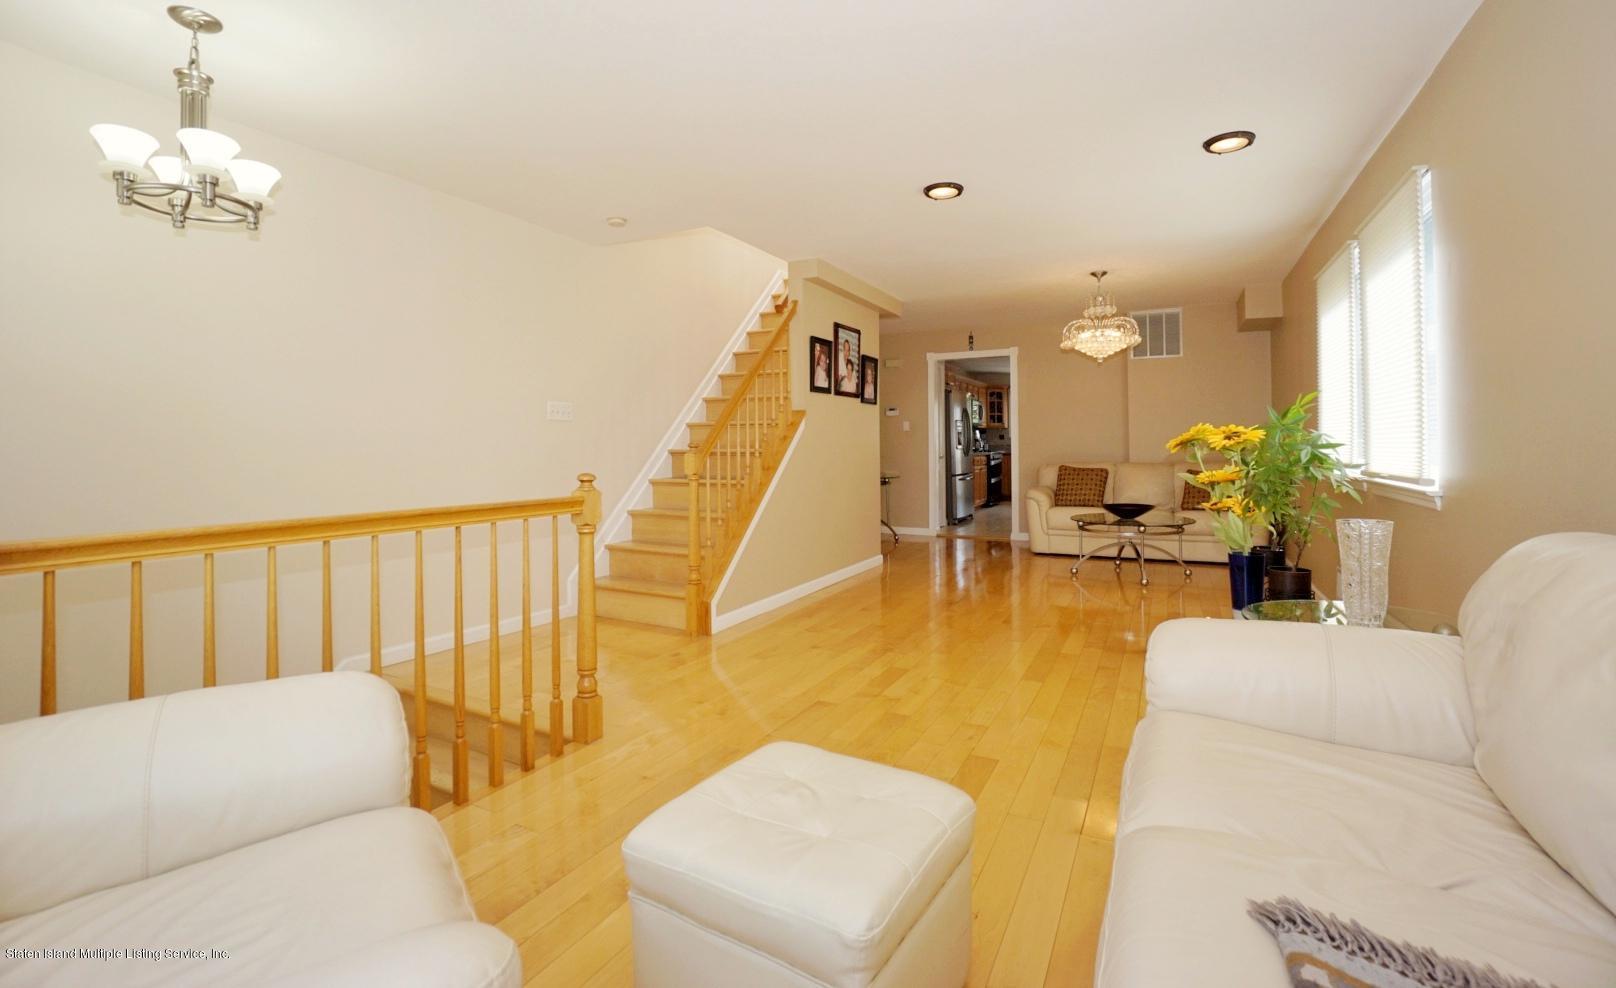 Single Family - Semi-Attached 18 Dunhill Lane  Staten Island, NY 10309, MLS-1139055-5